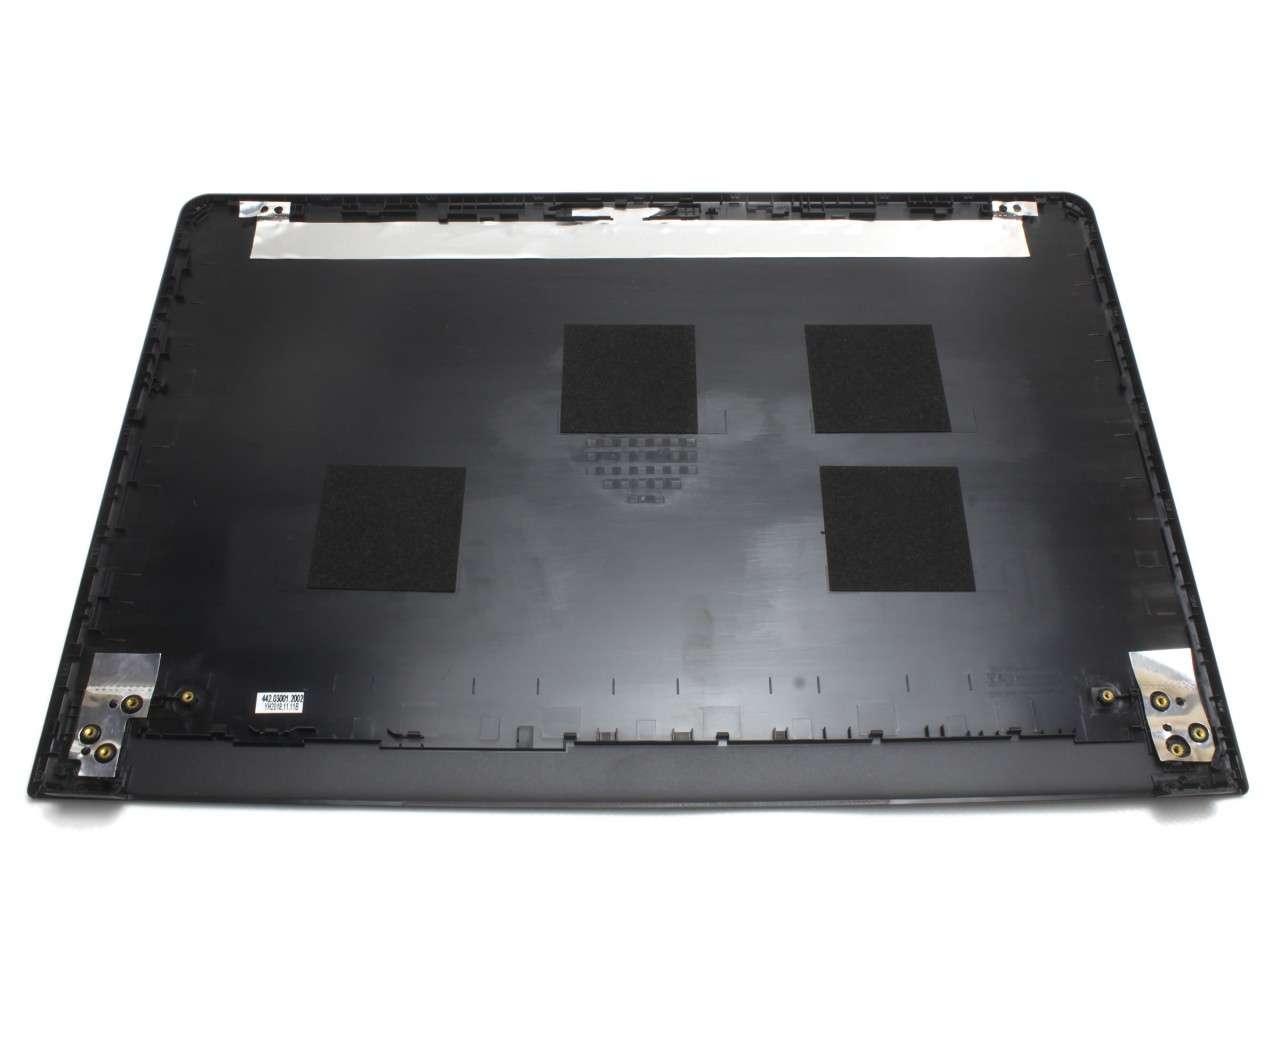 Capac Display BackCover Dell 442 03001 2002 Carcasa Display pentru laptop cu touchscreen imagine powerlaptop.ro 2021